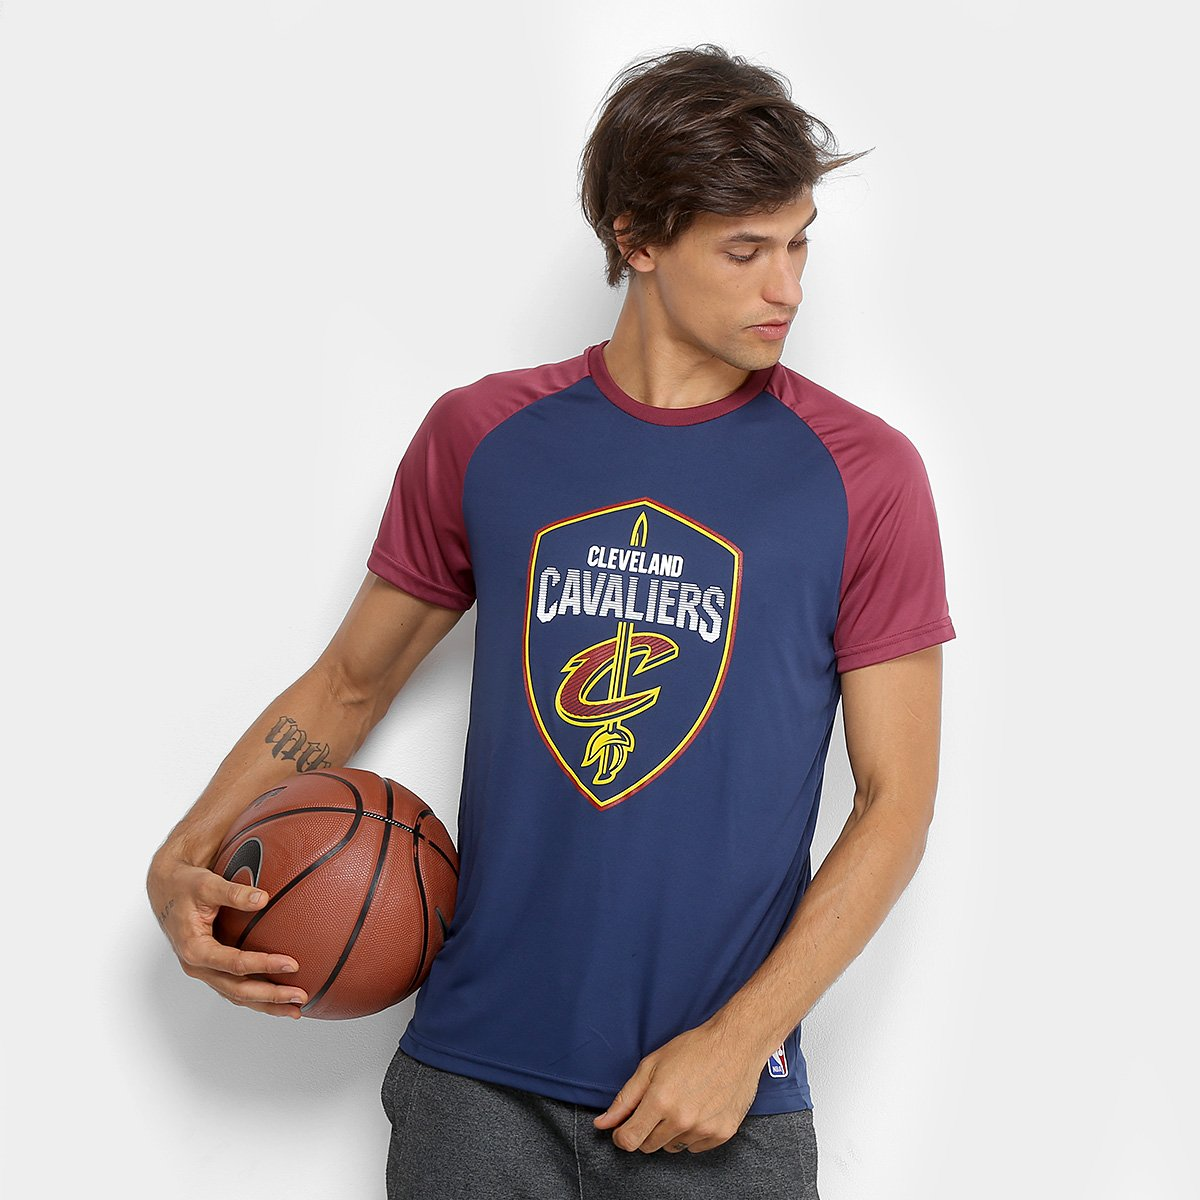 Camiseta NBA Cleveland Cavaliers Masculina - Bordô - Compre Agora ... 01af098d552c1